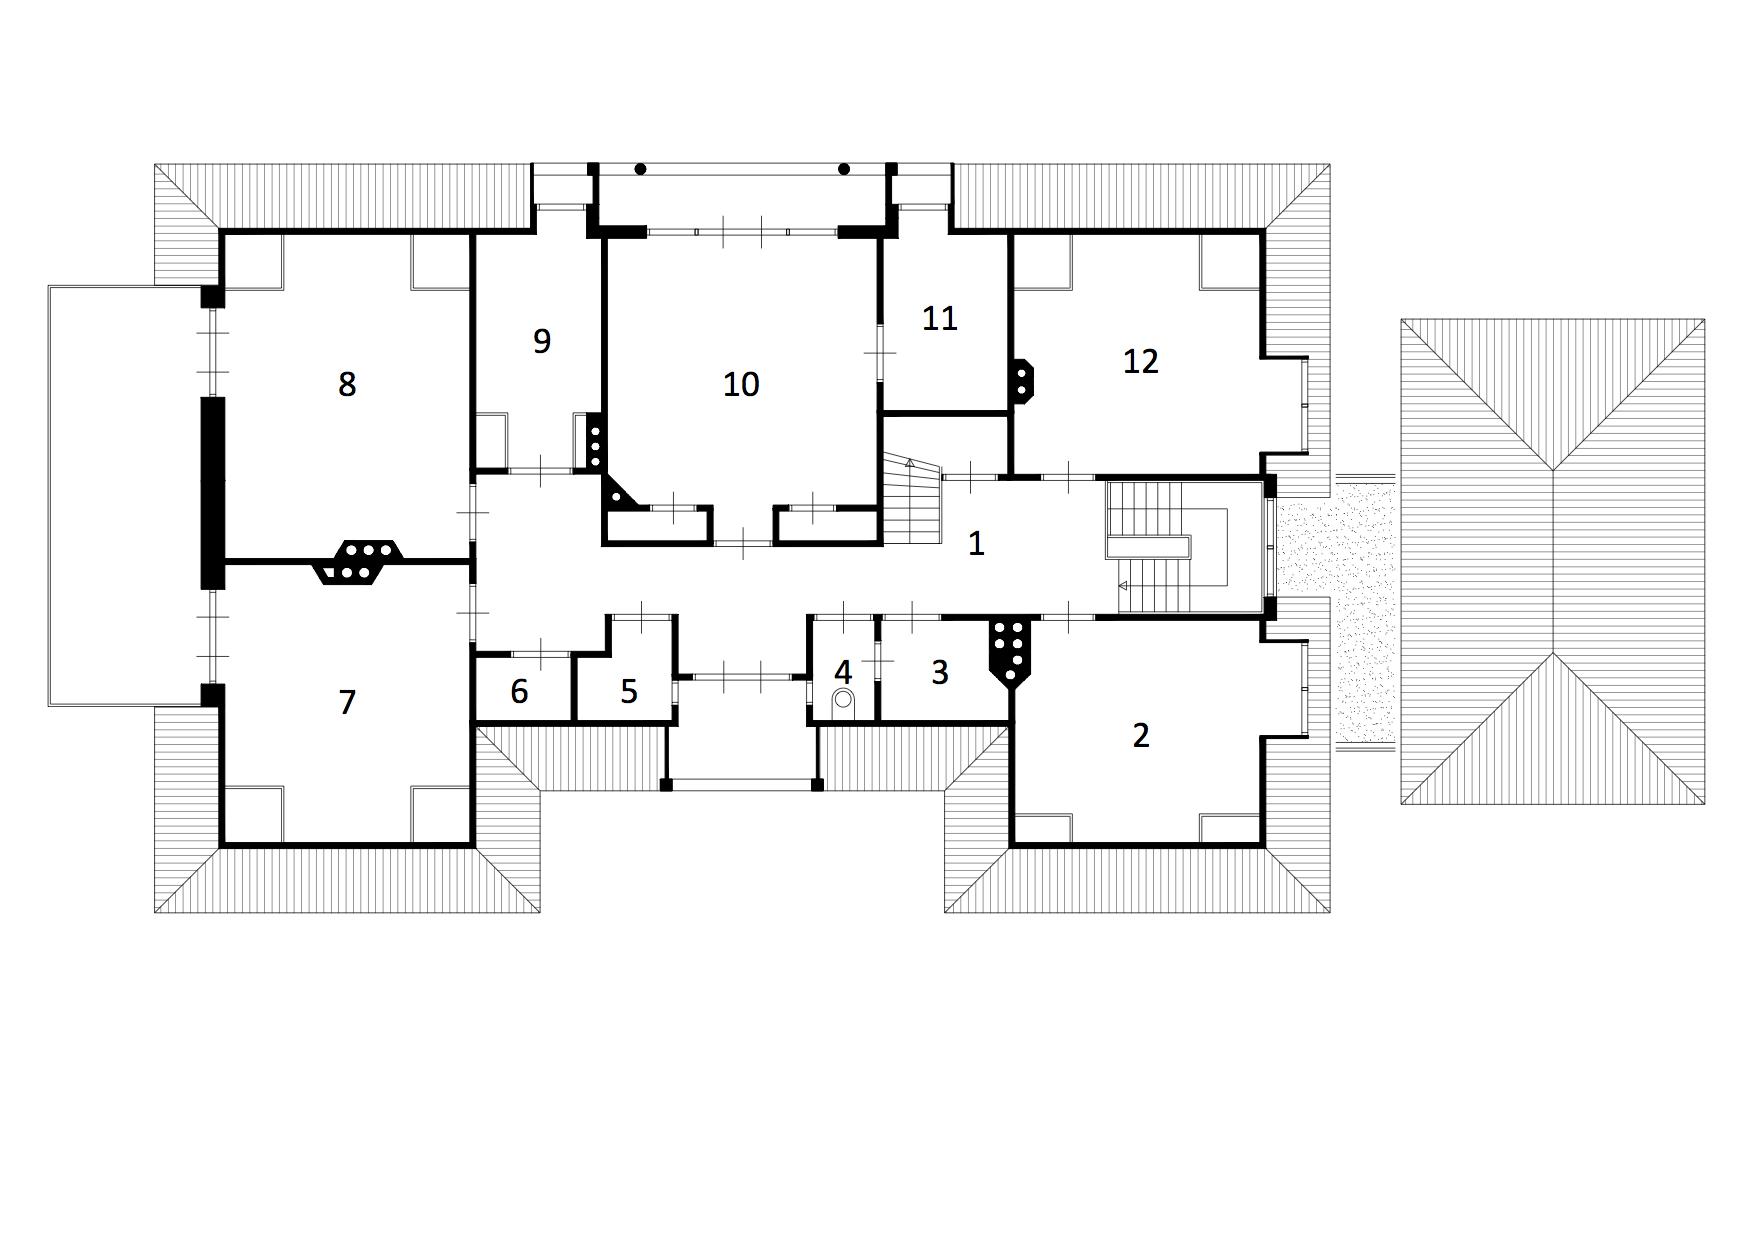 simple plattegrond verdieping op basis van de bestaande